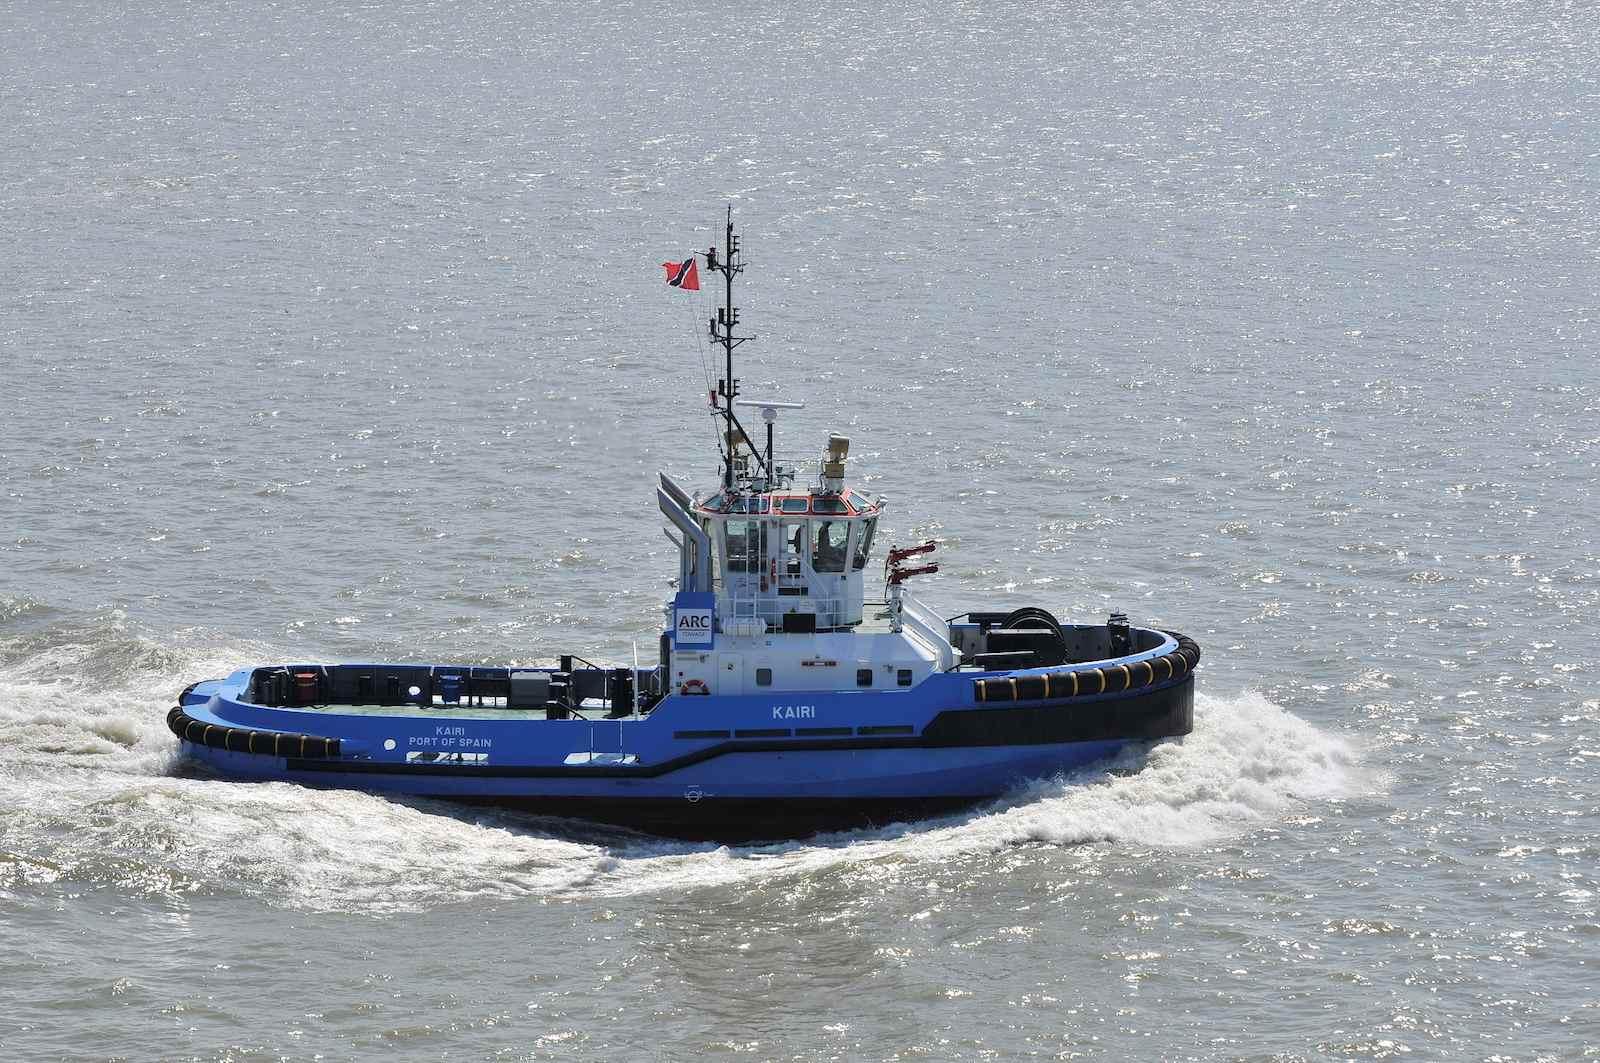 MV KAIRI, DAMEN ASD 2810, leaves for Trinidad